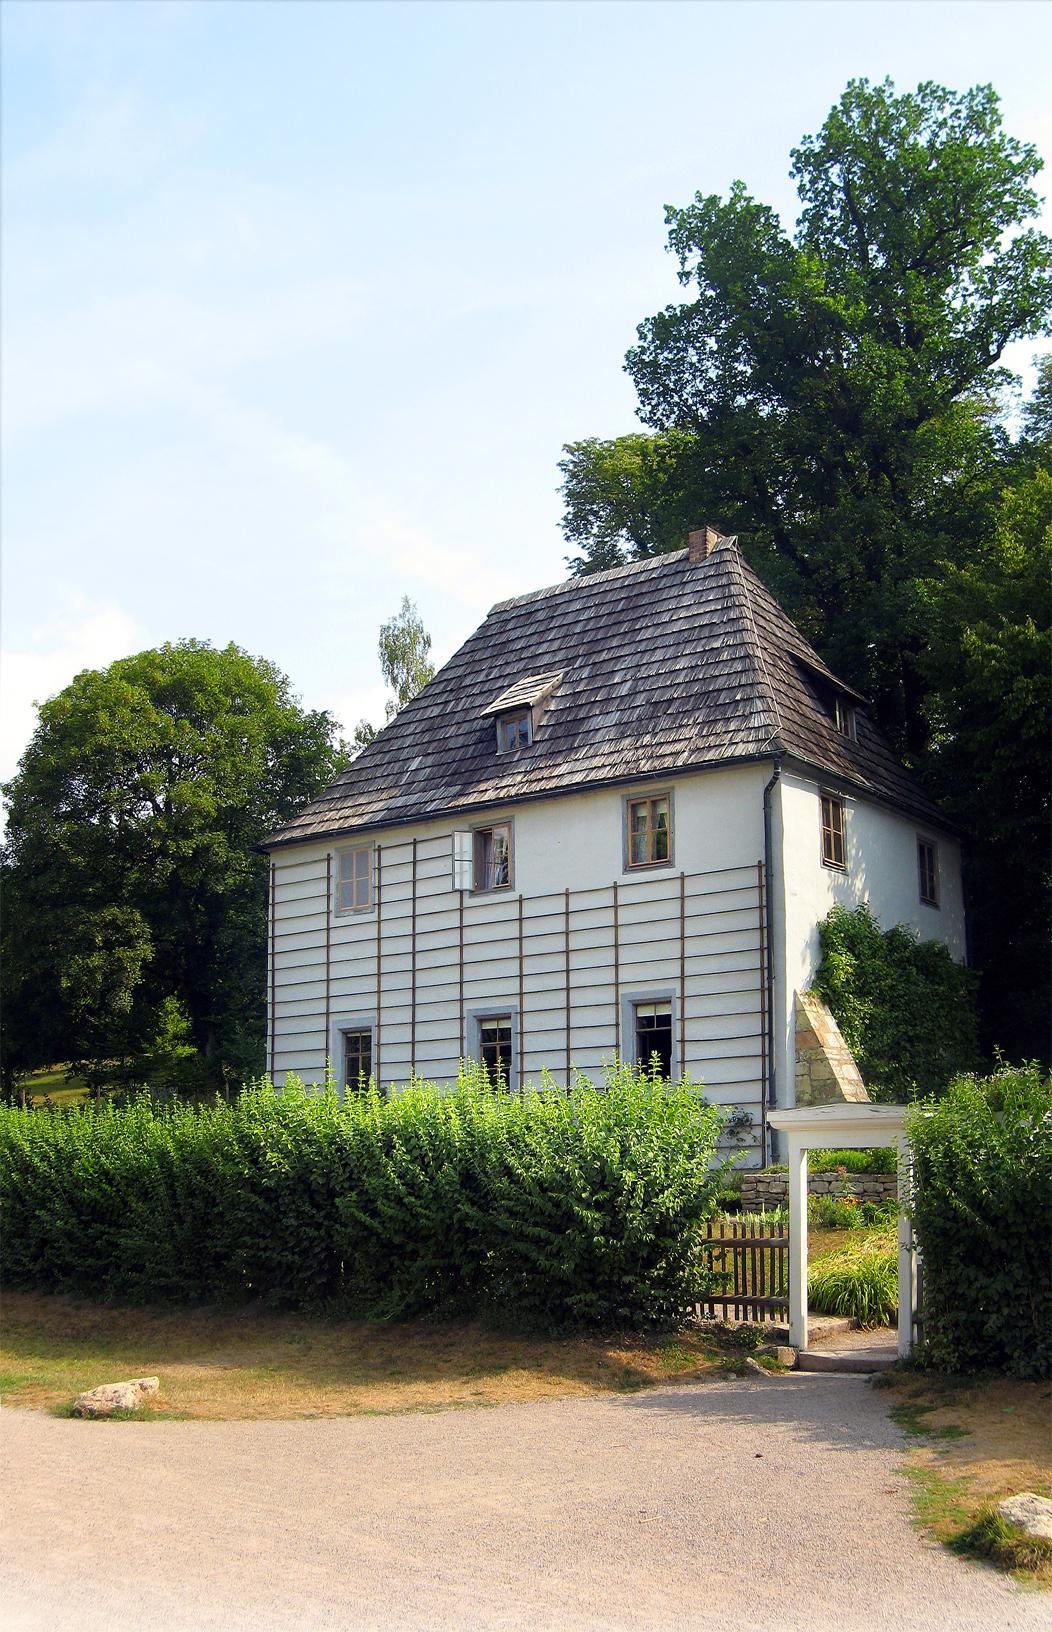 Casa giardino di goethe wikipedia for Casa giardino